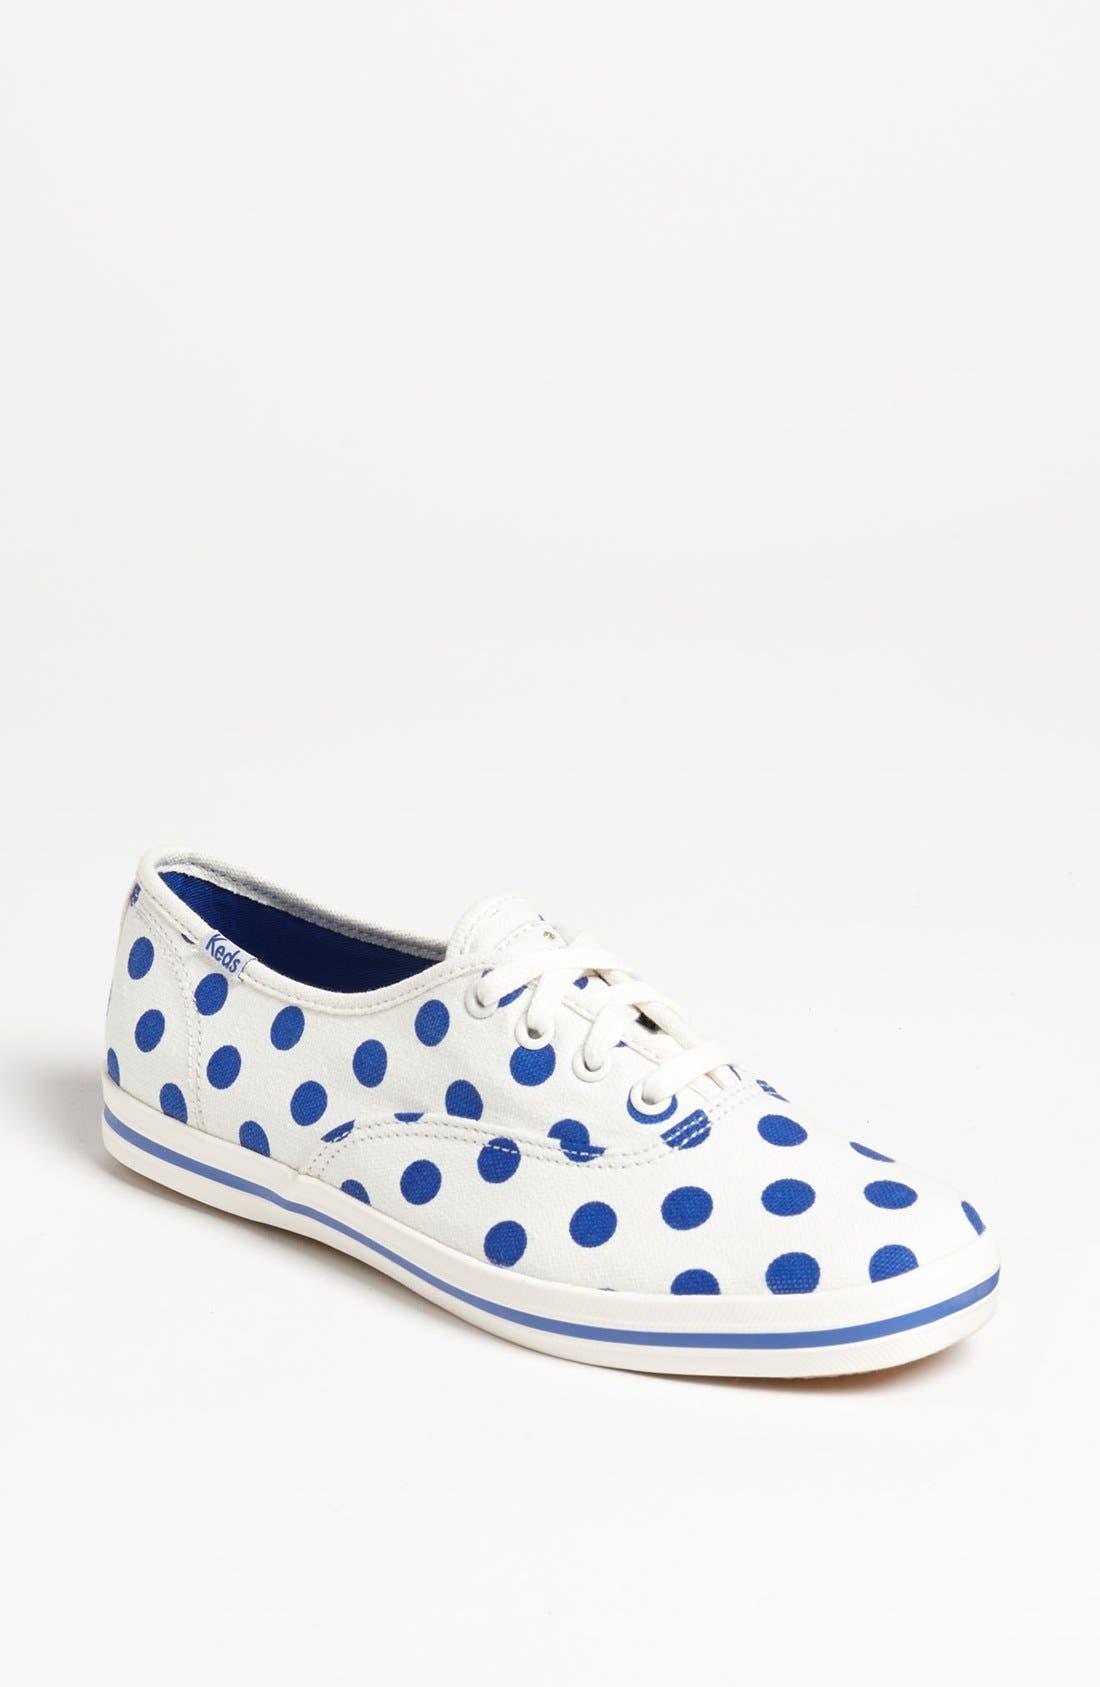 Keds<sup>®</sup> for kate spade new york 'kick' sneaker,                         Main,                         color,